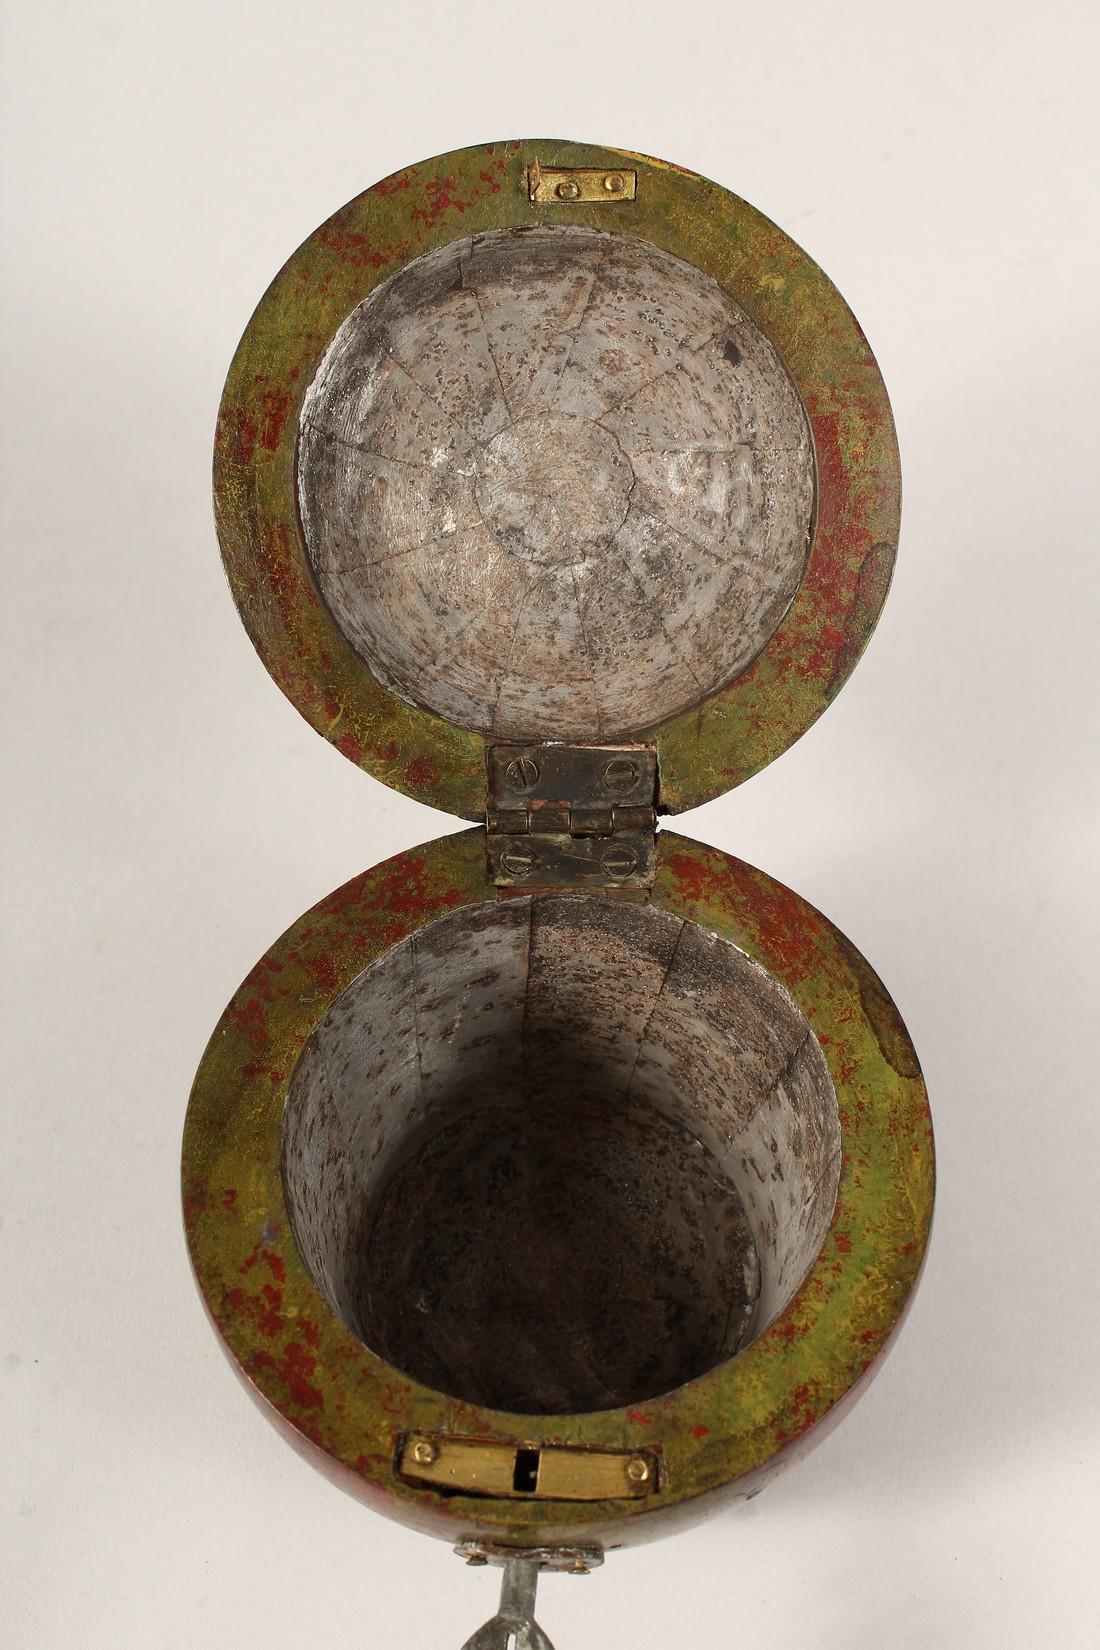 A GOOD GEORGIAN STYLE PAINTED APPLE TEA CADDY. 4ins diameter. - Image 4 of 5